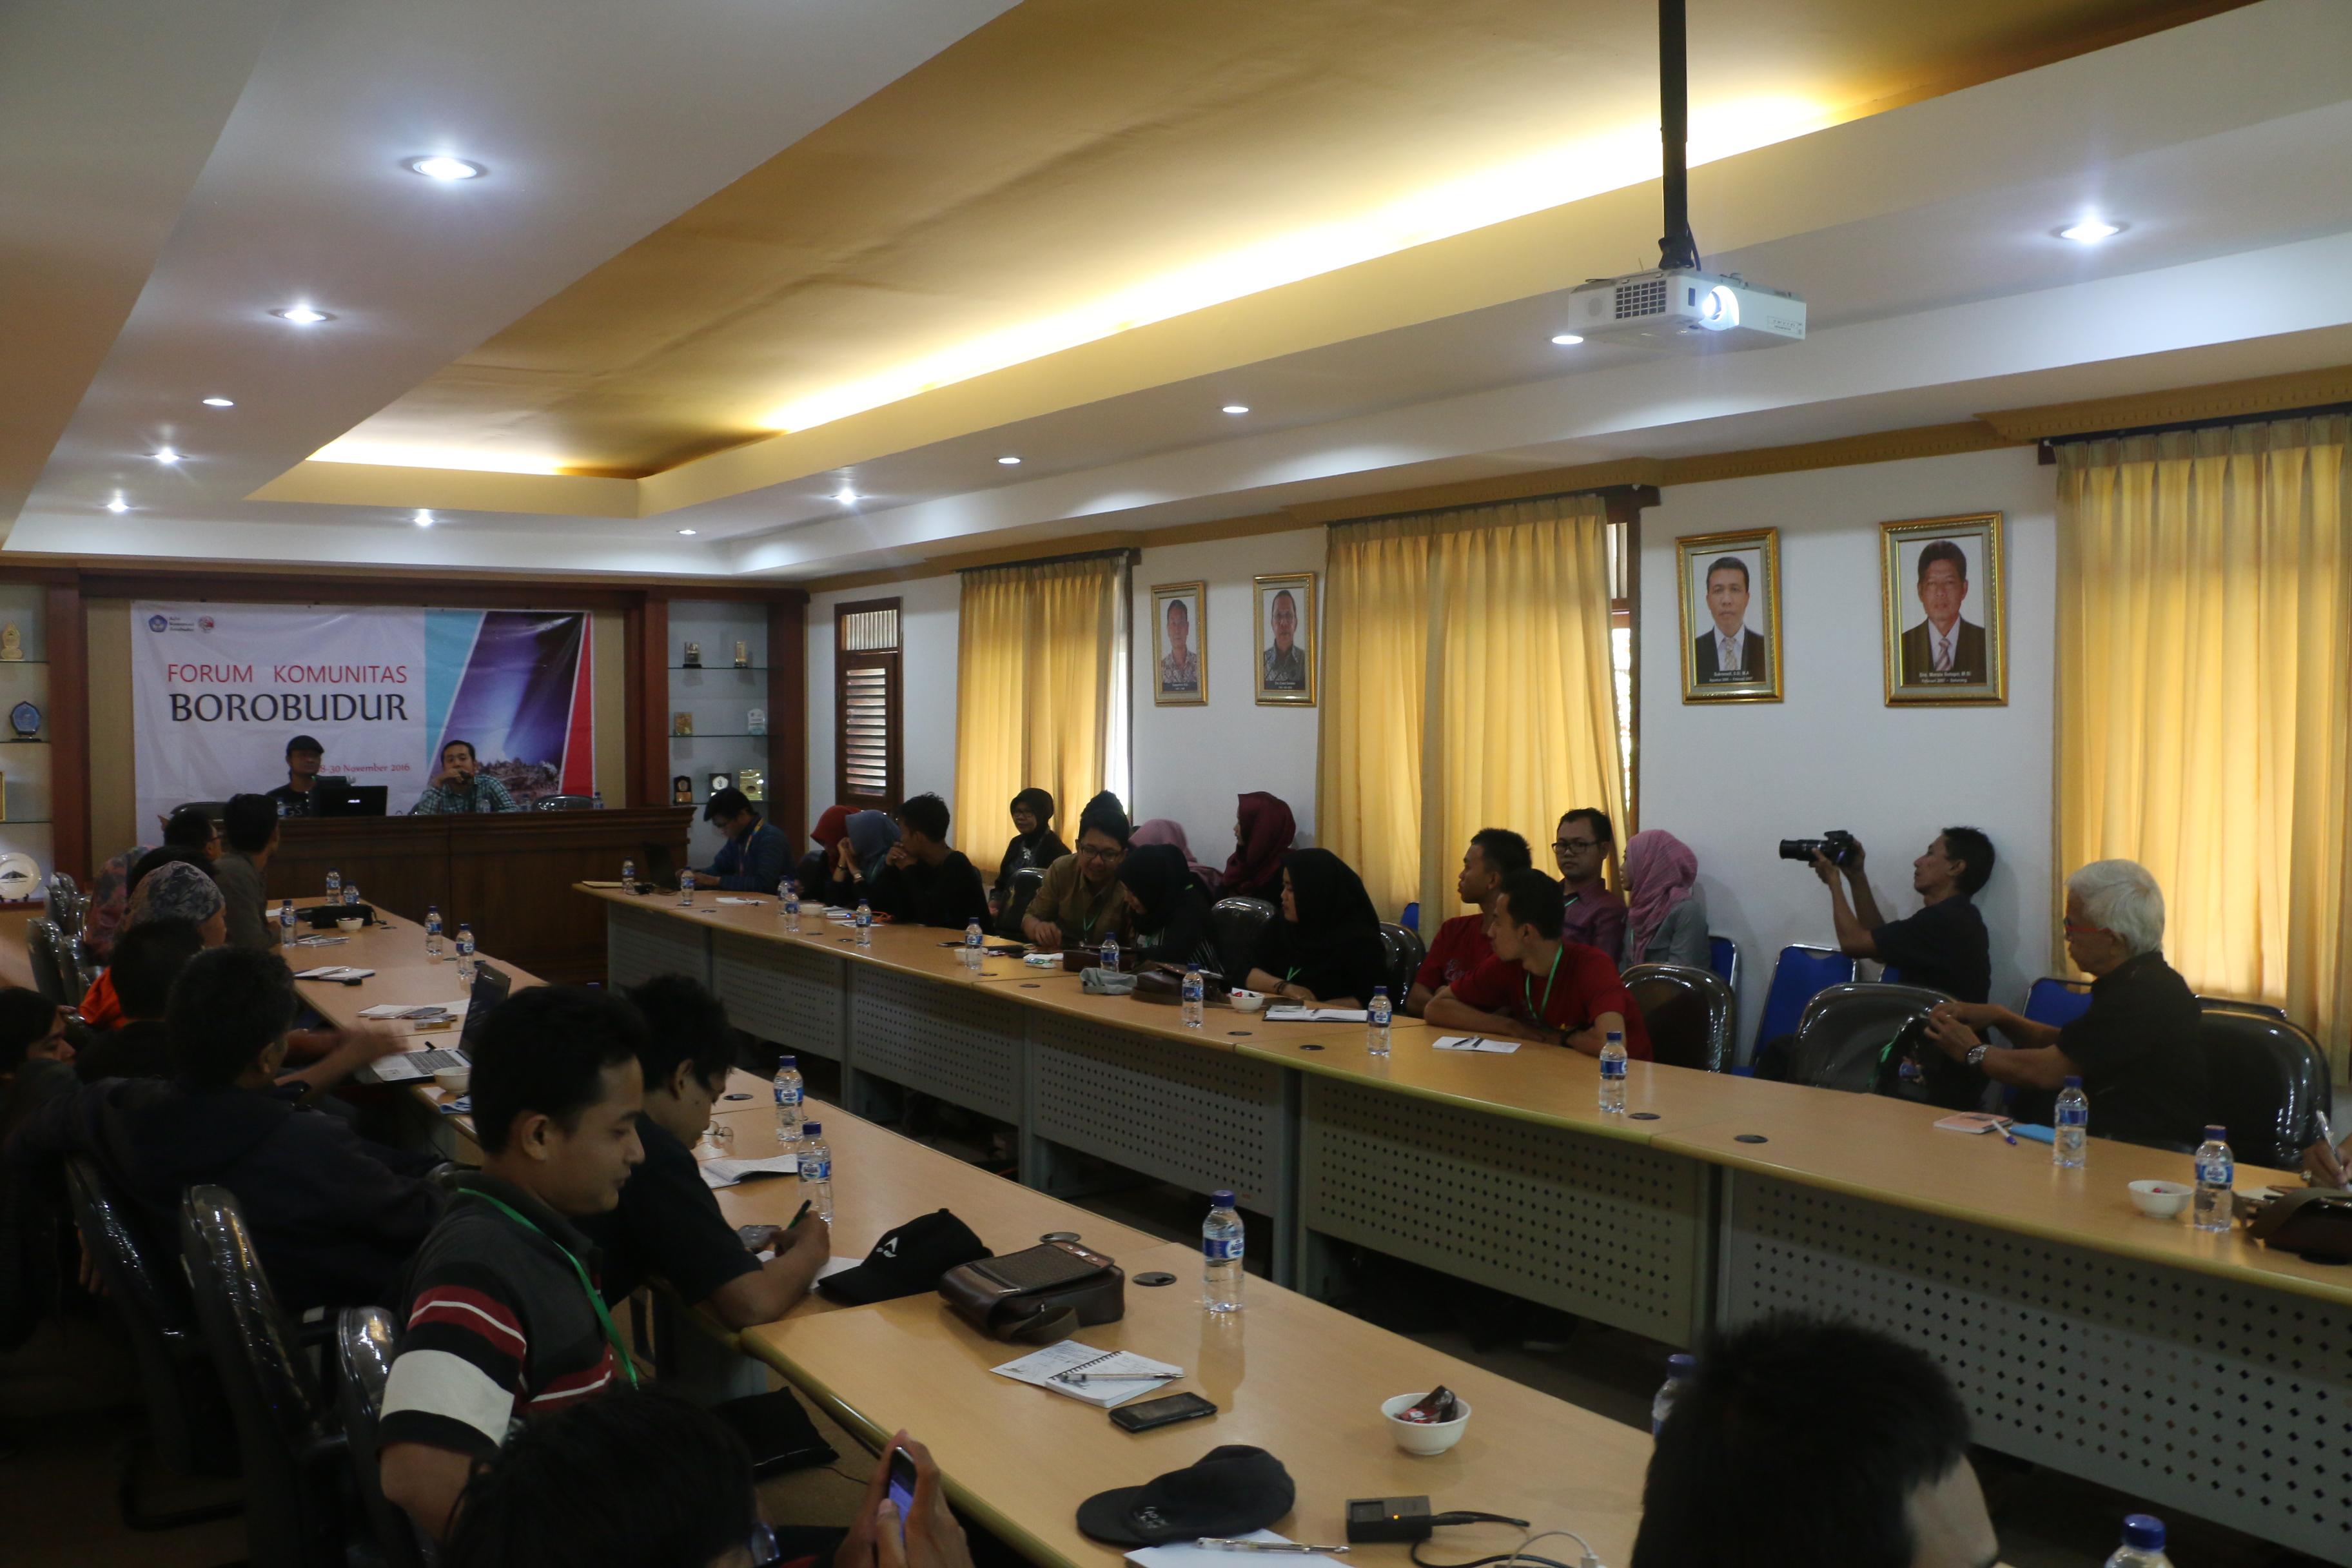 Forum Komunitas Borobudur